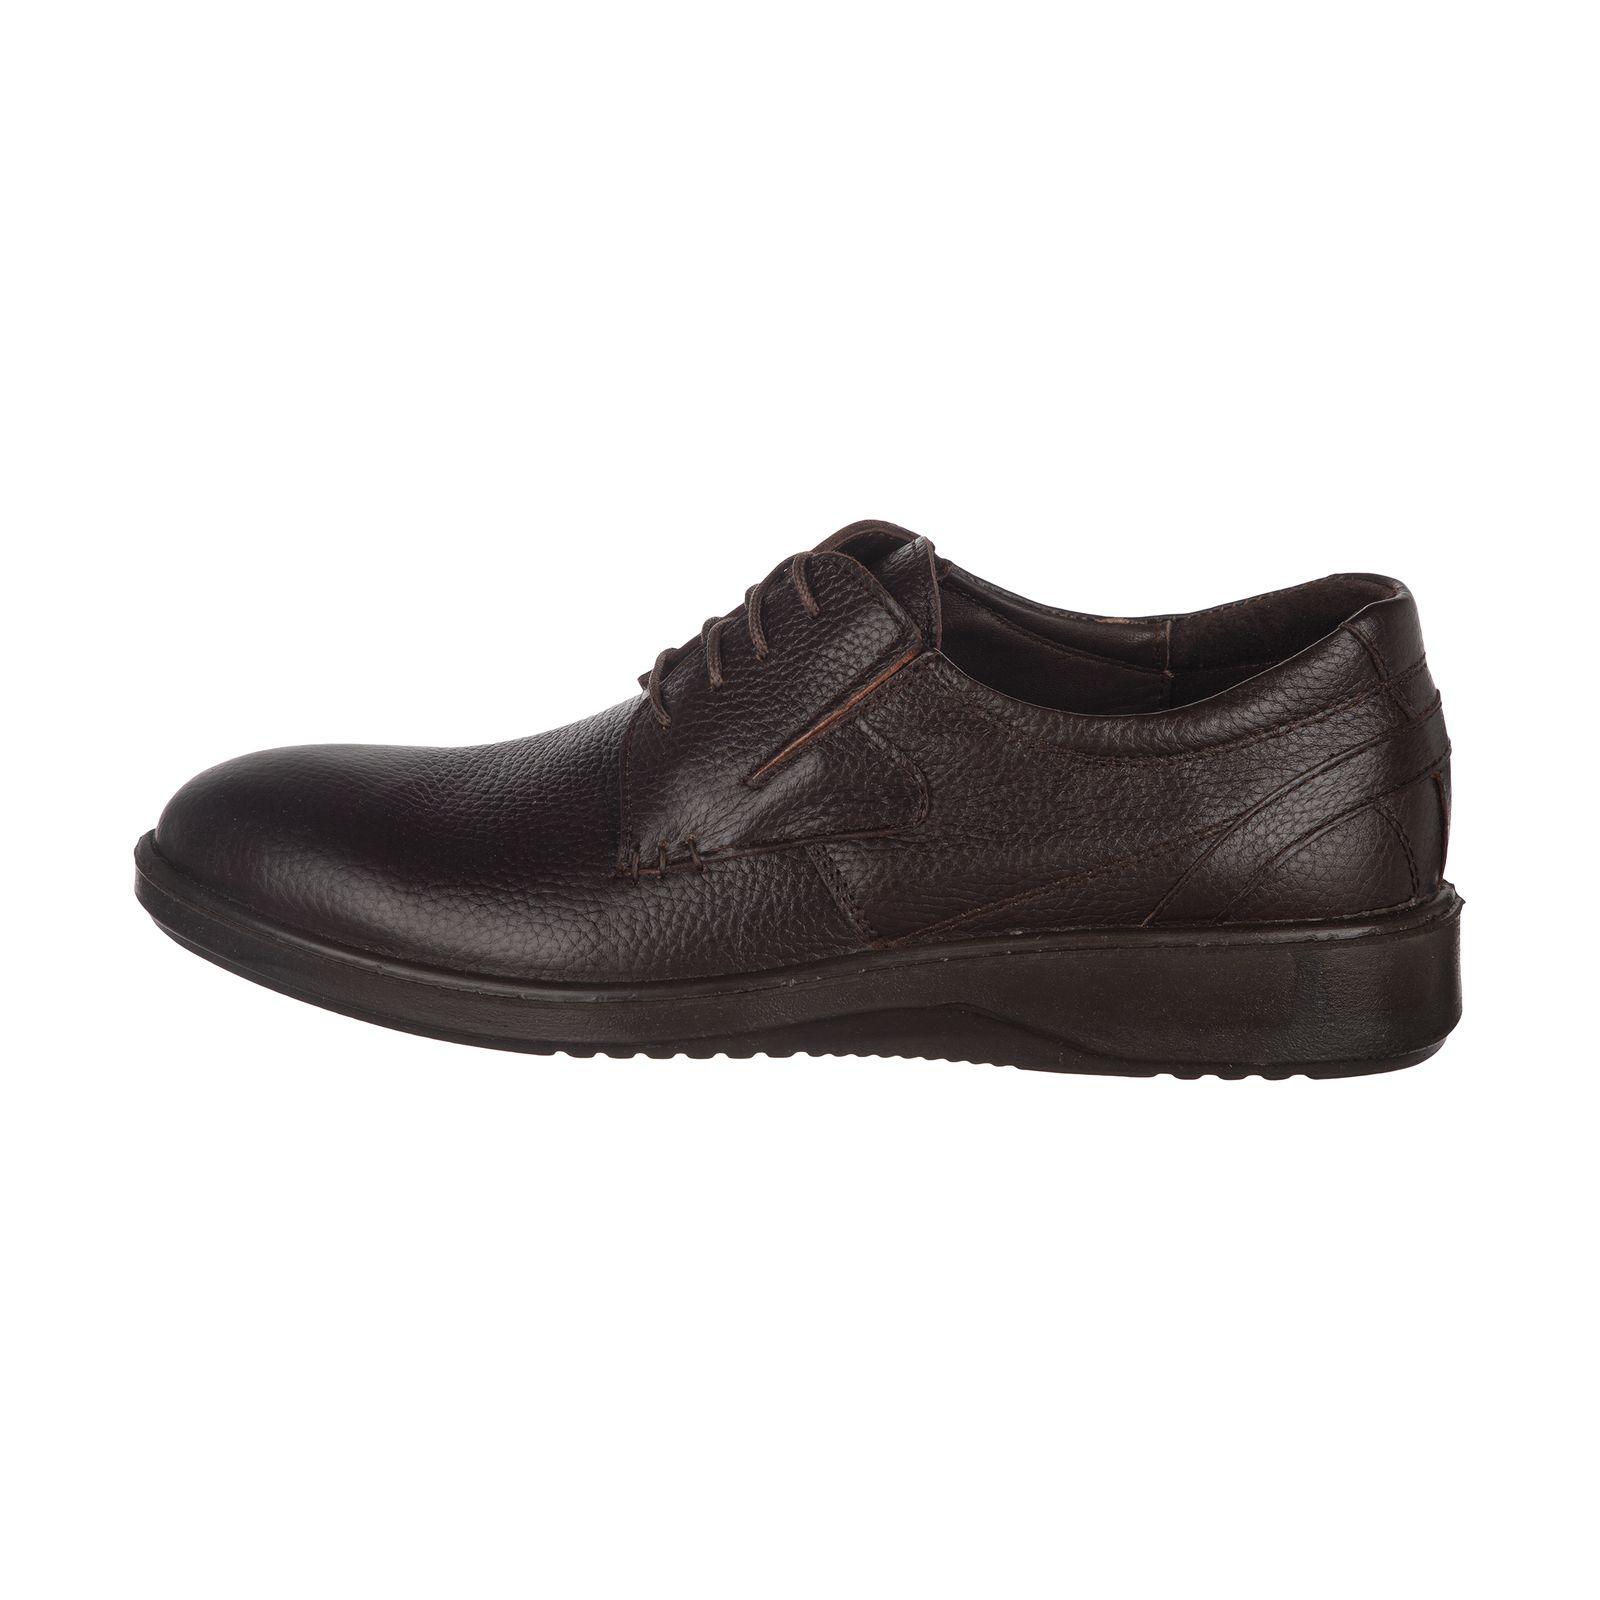 کفش روزمره مردانه آذر پلاس مدل 9438B503104 -  - 2